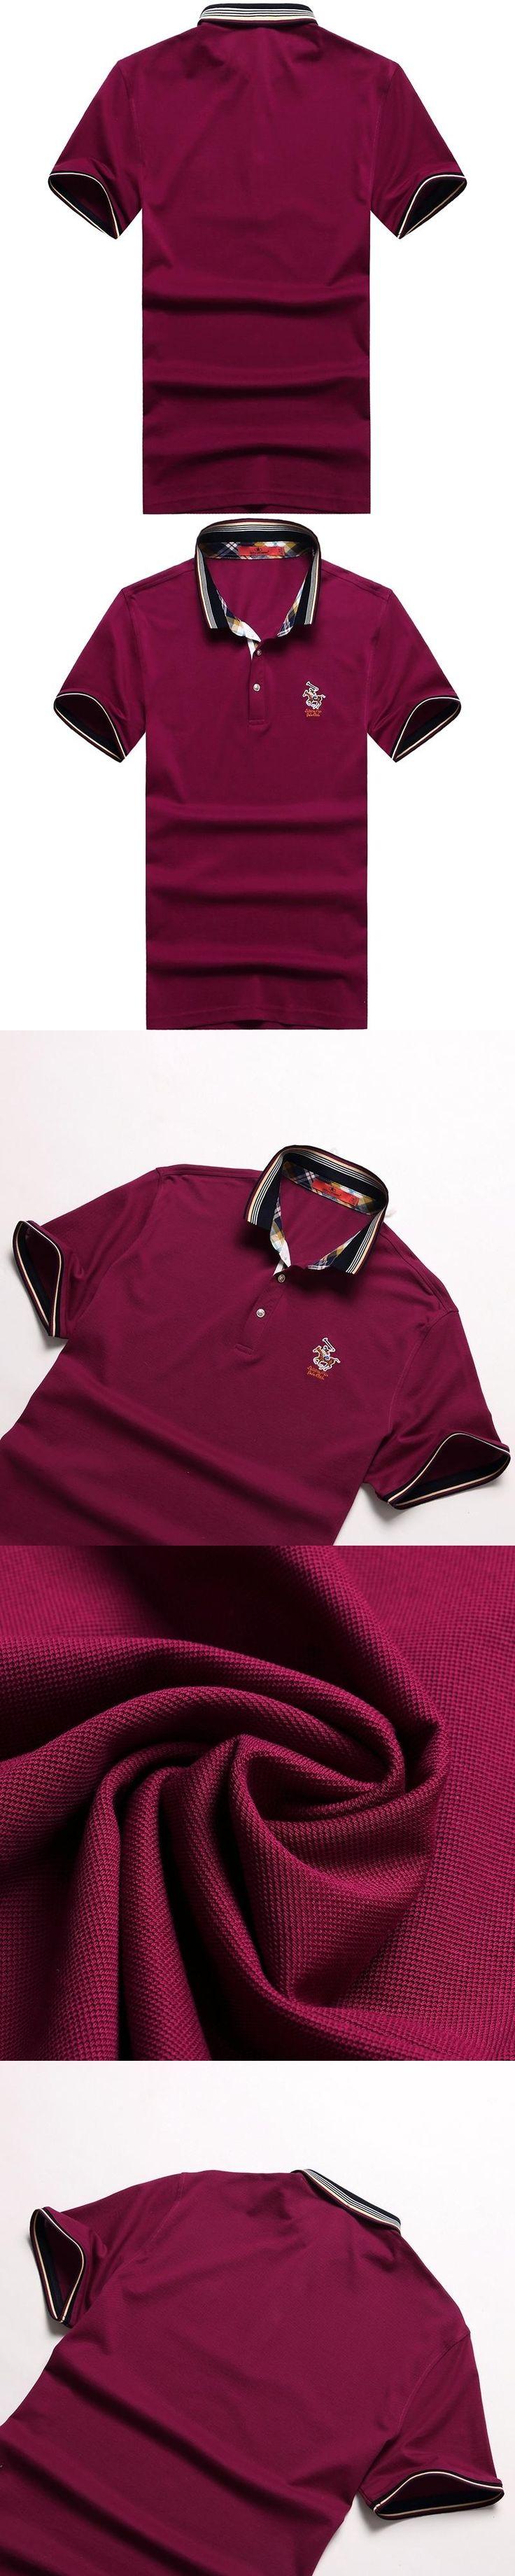 9XL 8XL 7XL 6XL 5XL Men Polo Shirt Slim Fit Short Sleeve 100% Cotton Brand Clothing Fashion Summer Letter Logo Mens Polo Shirts